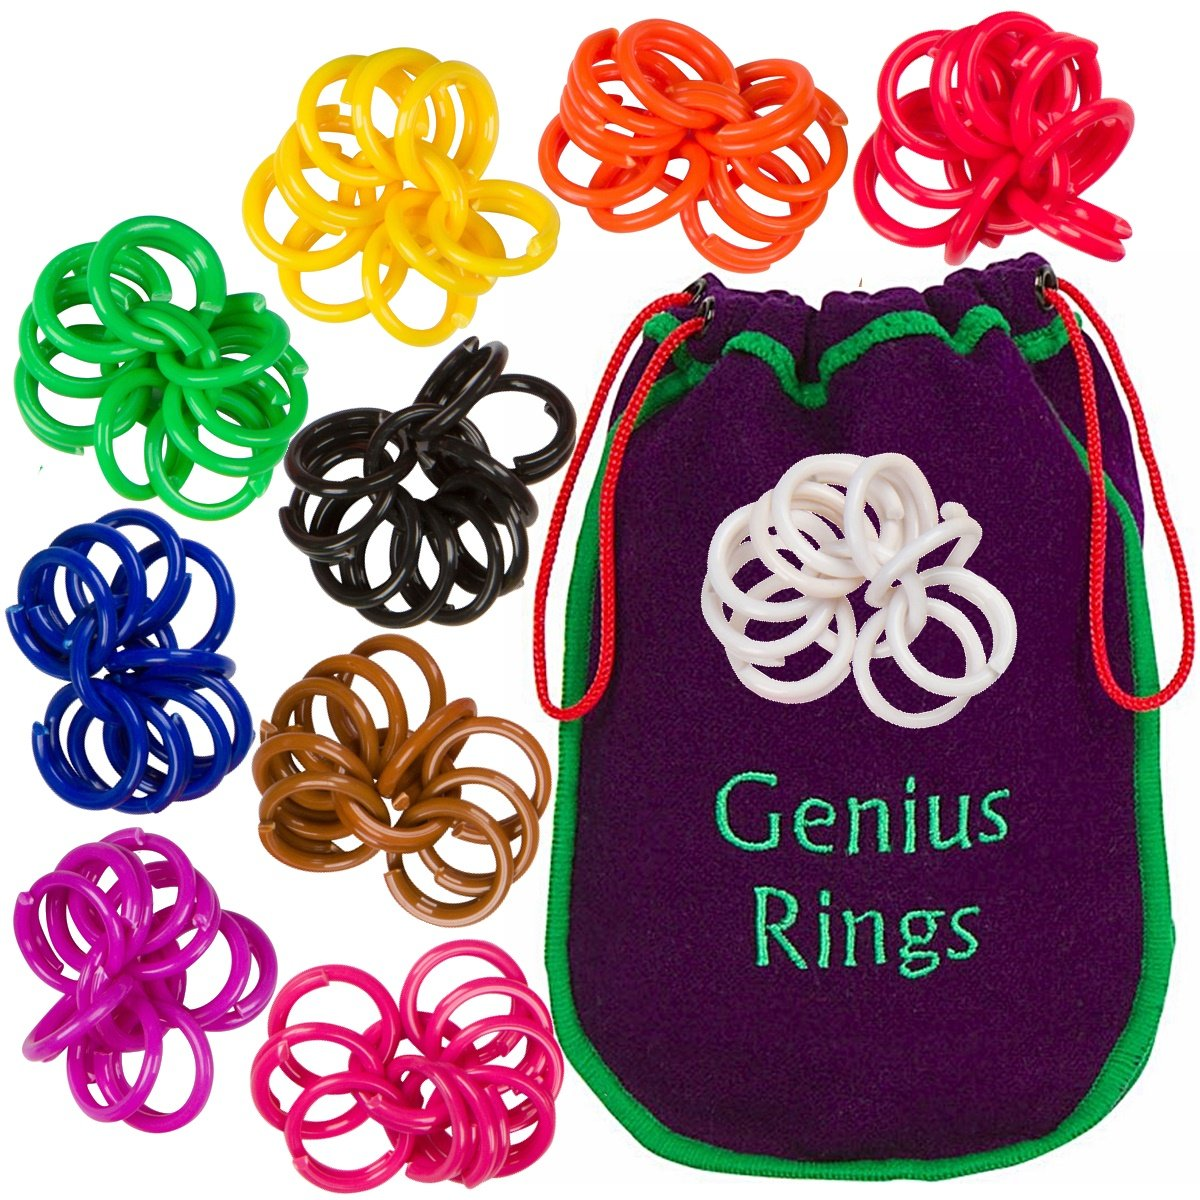 Genius Rings Chinese Jacks